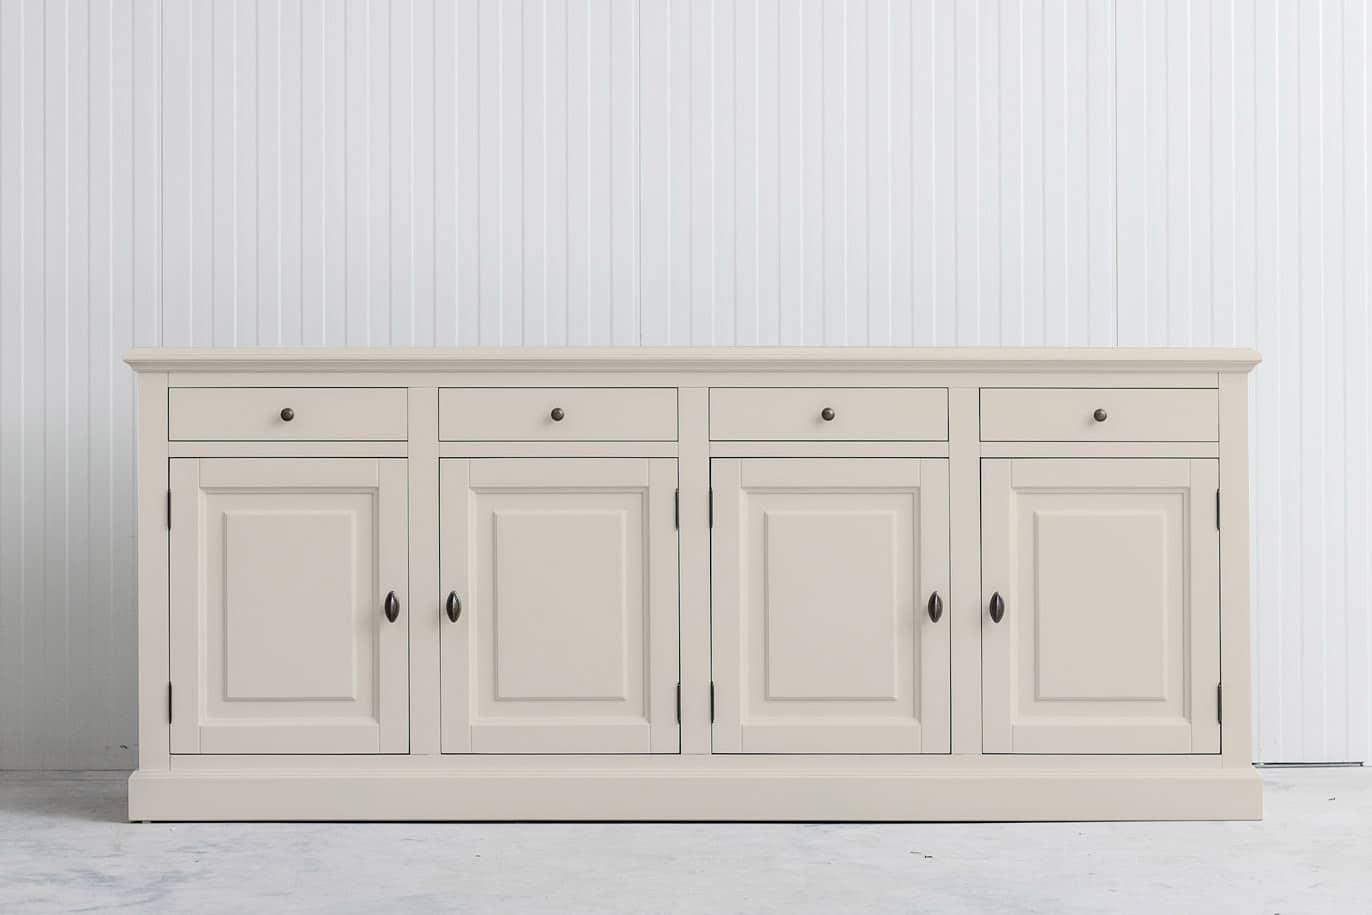 Landelijk dressoir Bo 4×4 crèmewit (RAL 9001)